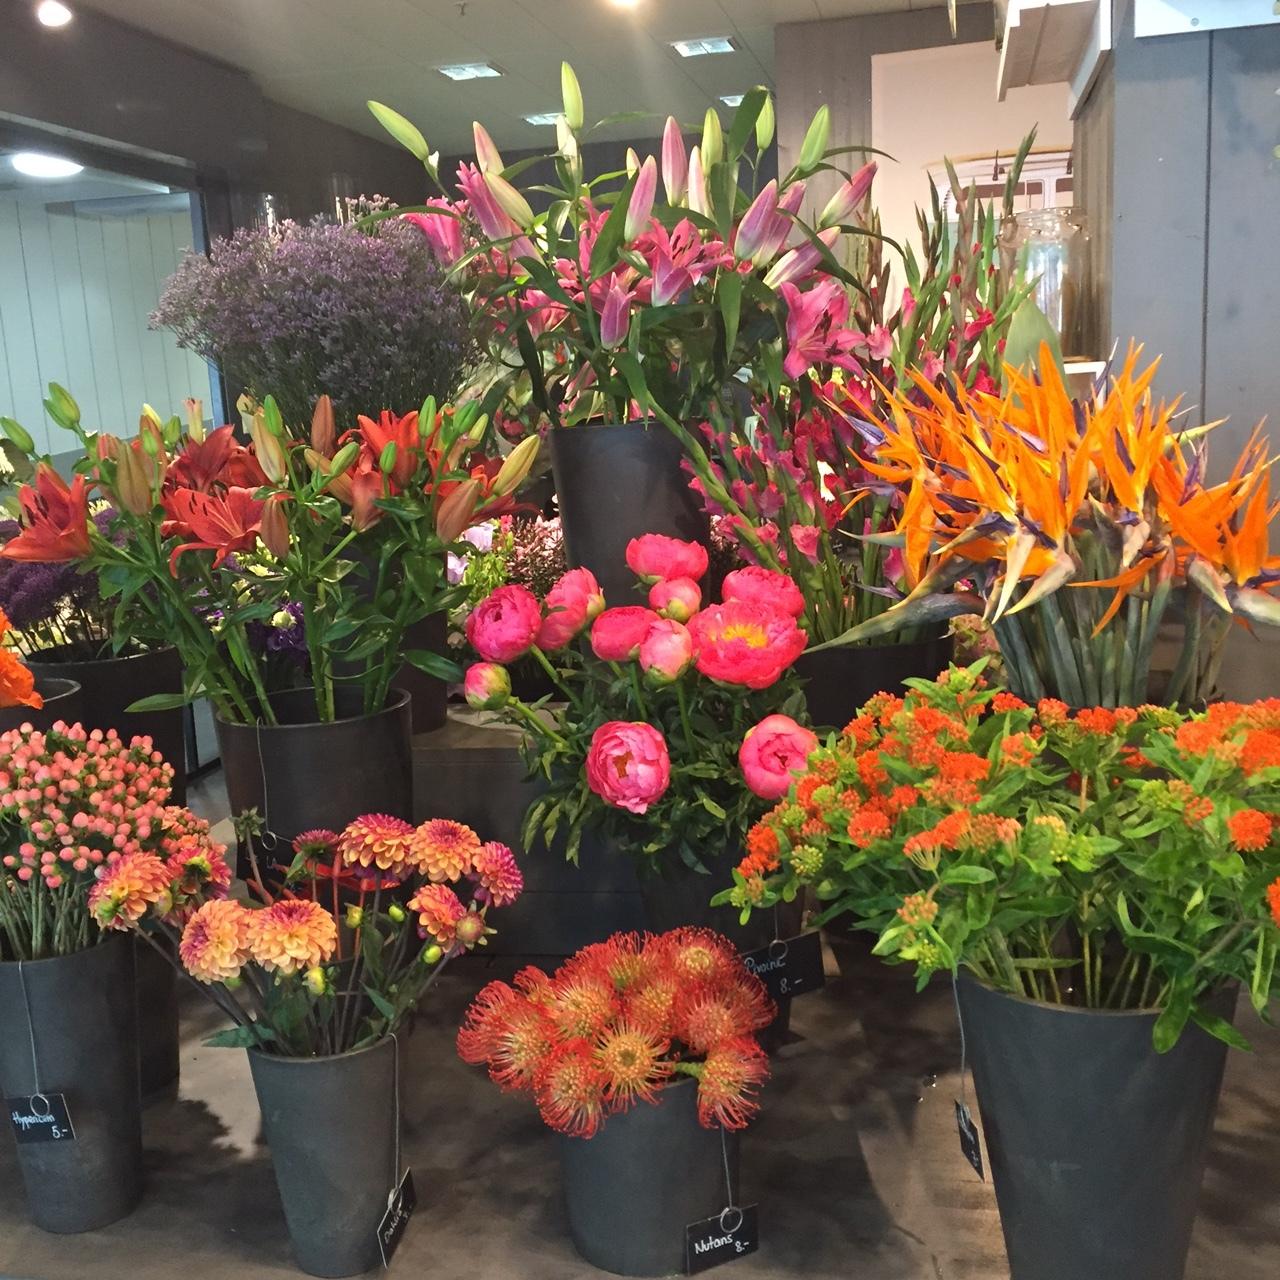 Fleuriot Fluers at the Geneva Airport, Switzerland - www.stampedwithaloha.com